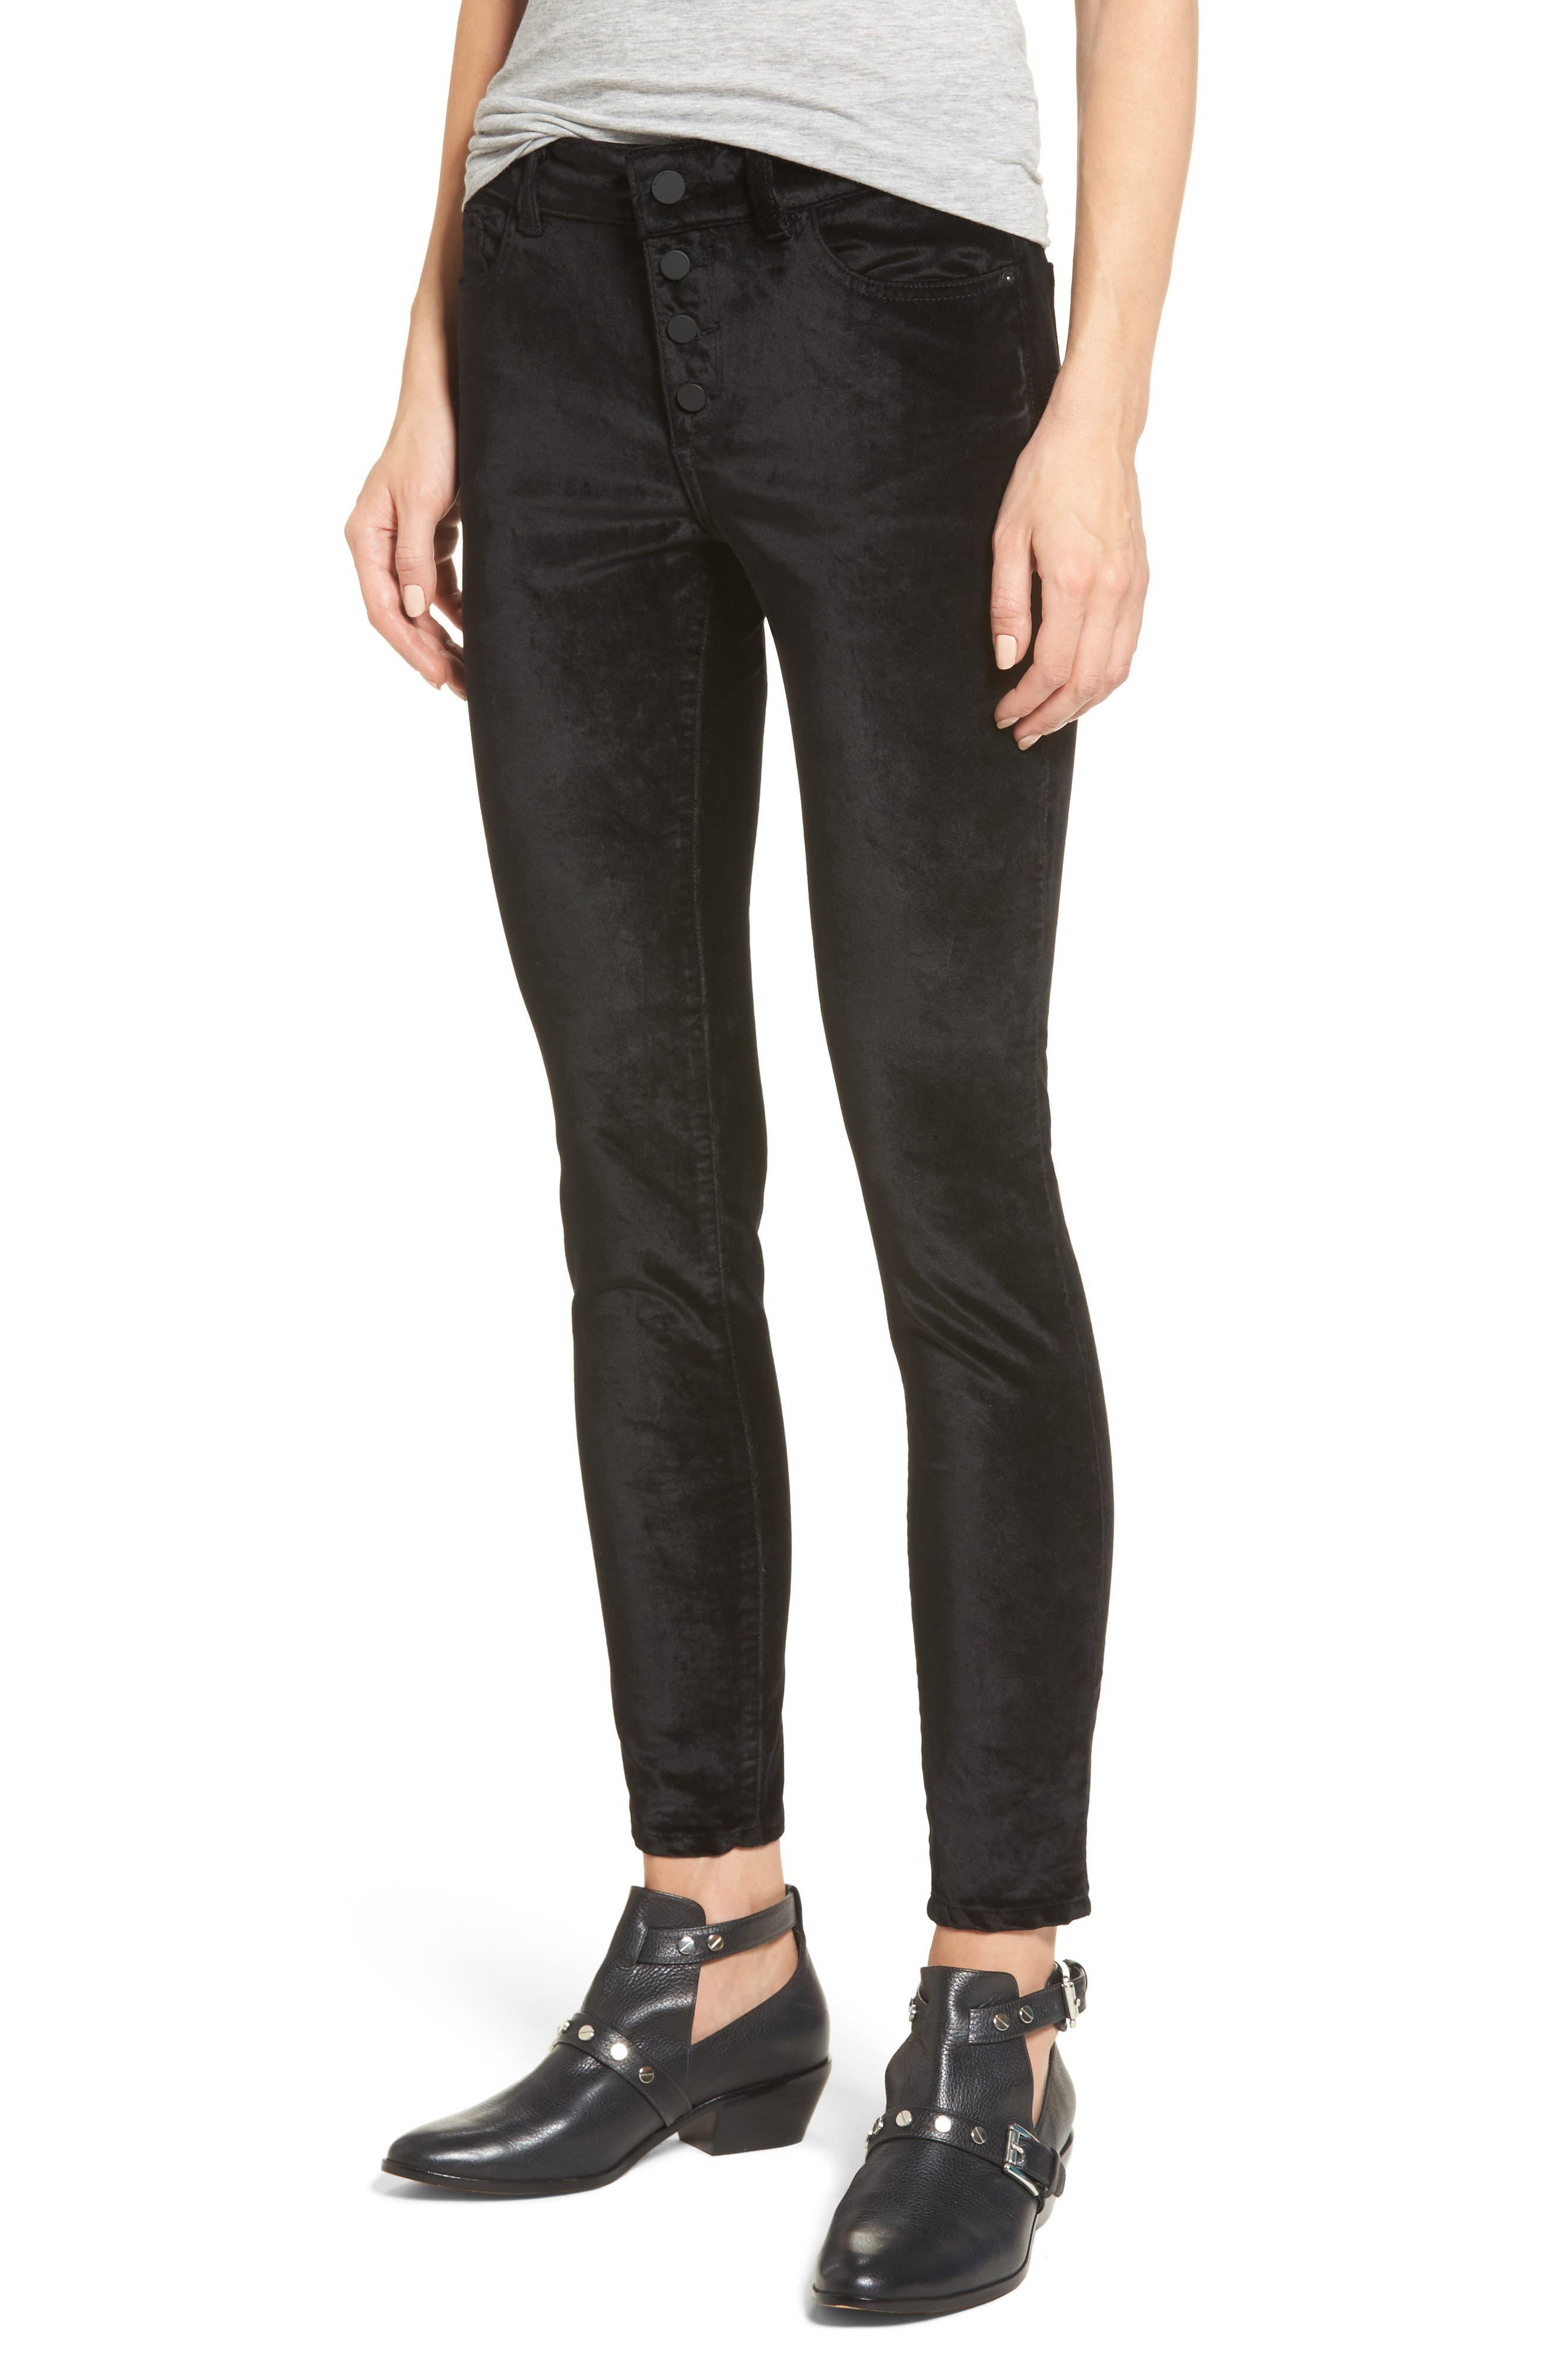 Alternate Image 1 Selected - DL1961 Emma Power Legging Jeans (Jet Black)